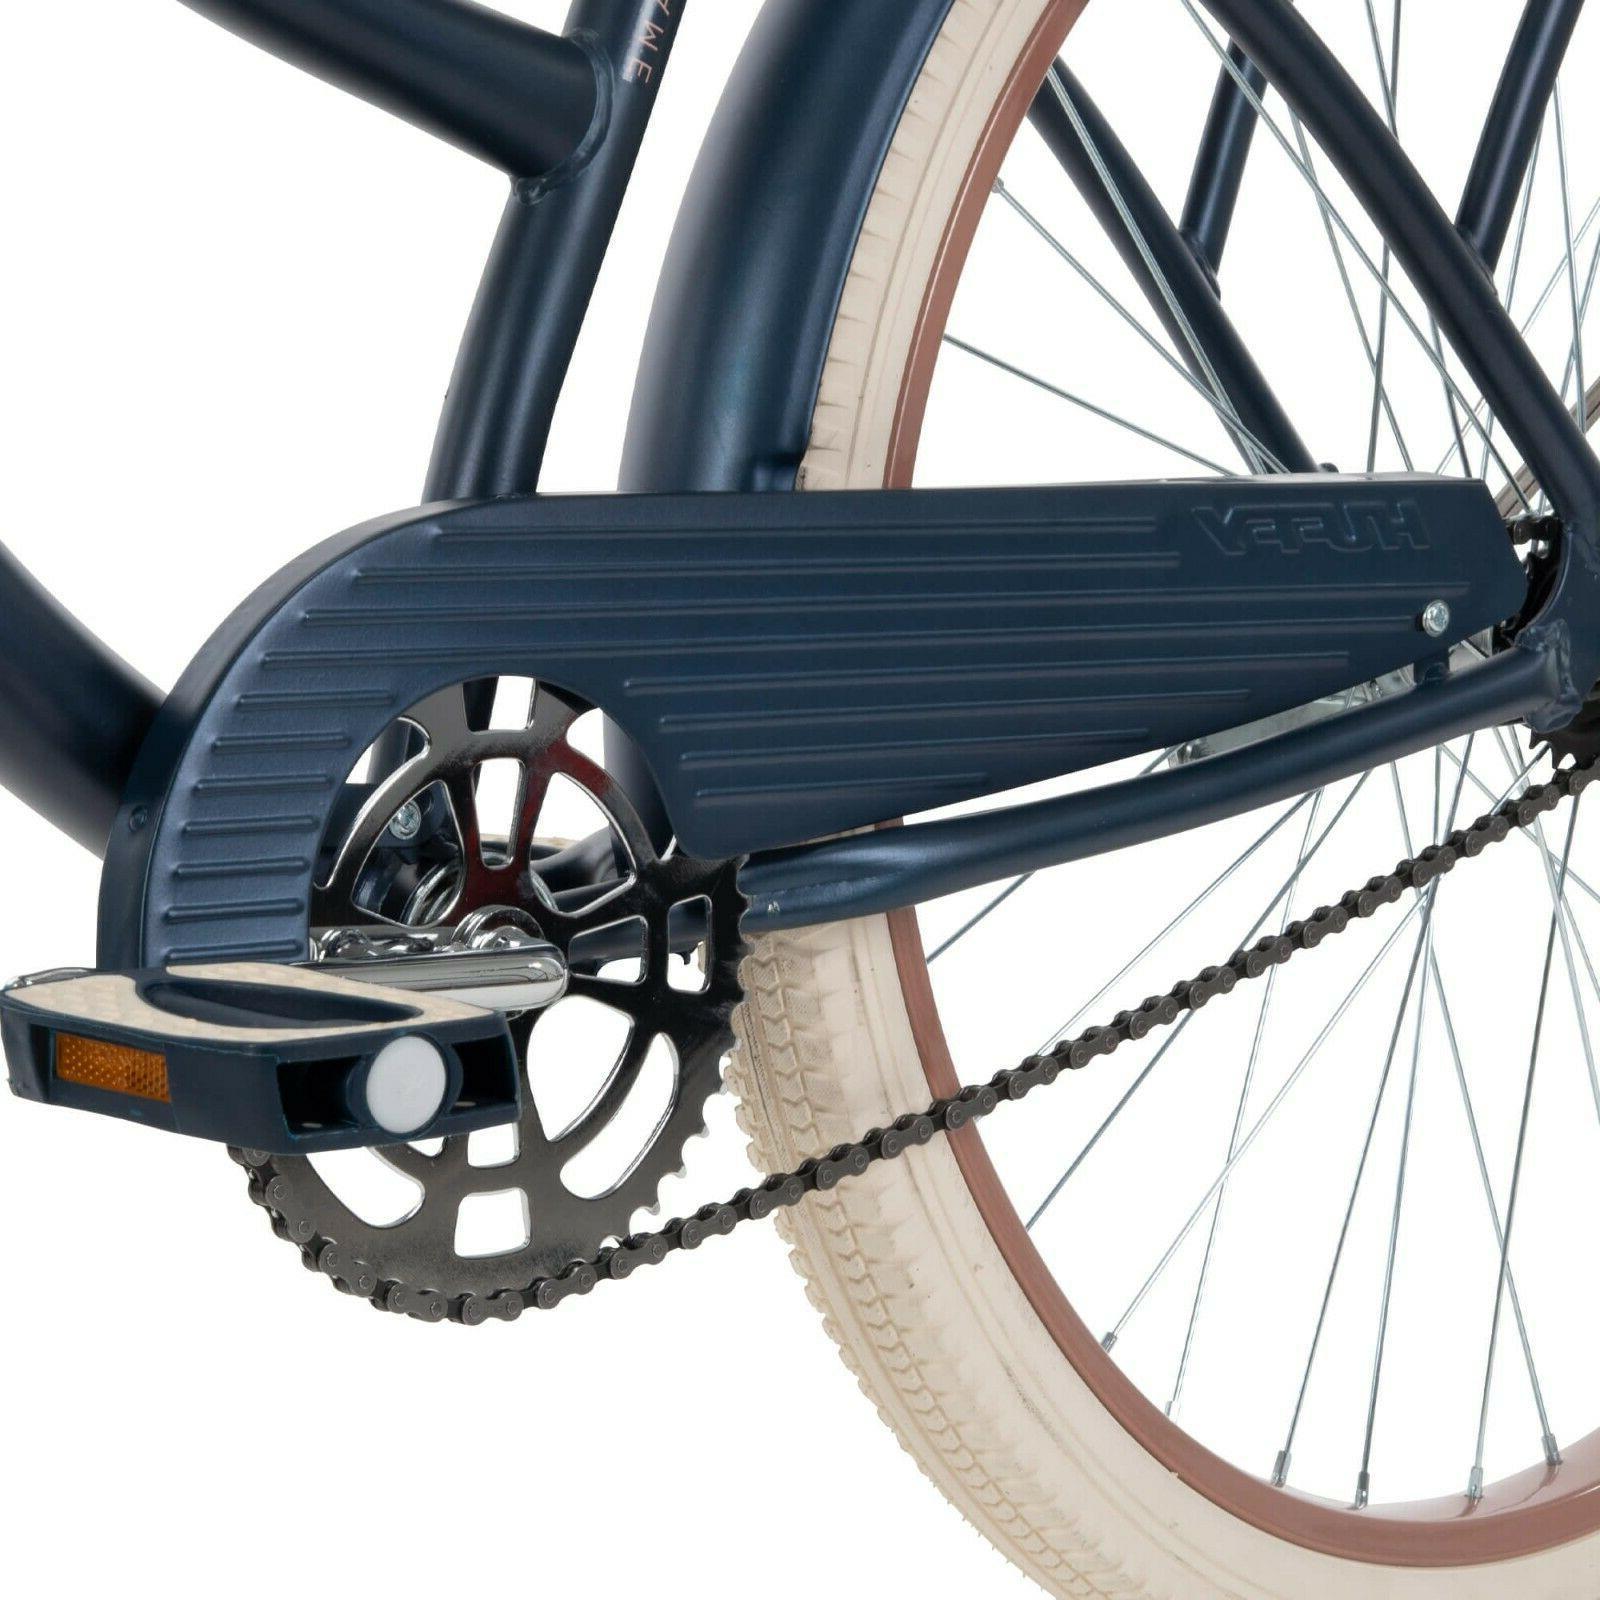 Huffy Women's Beach Cruiser Bike, Blue - Brand & Free